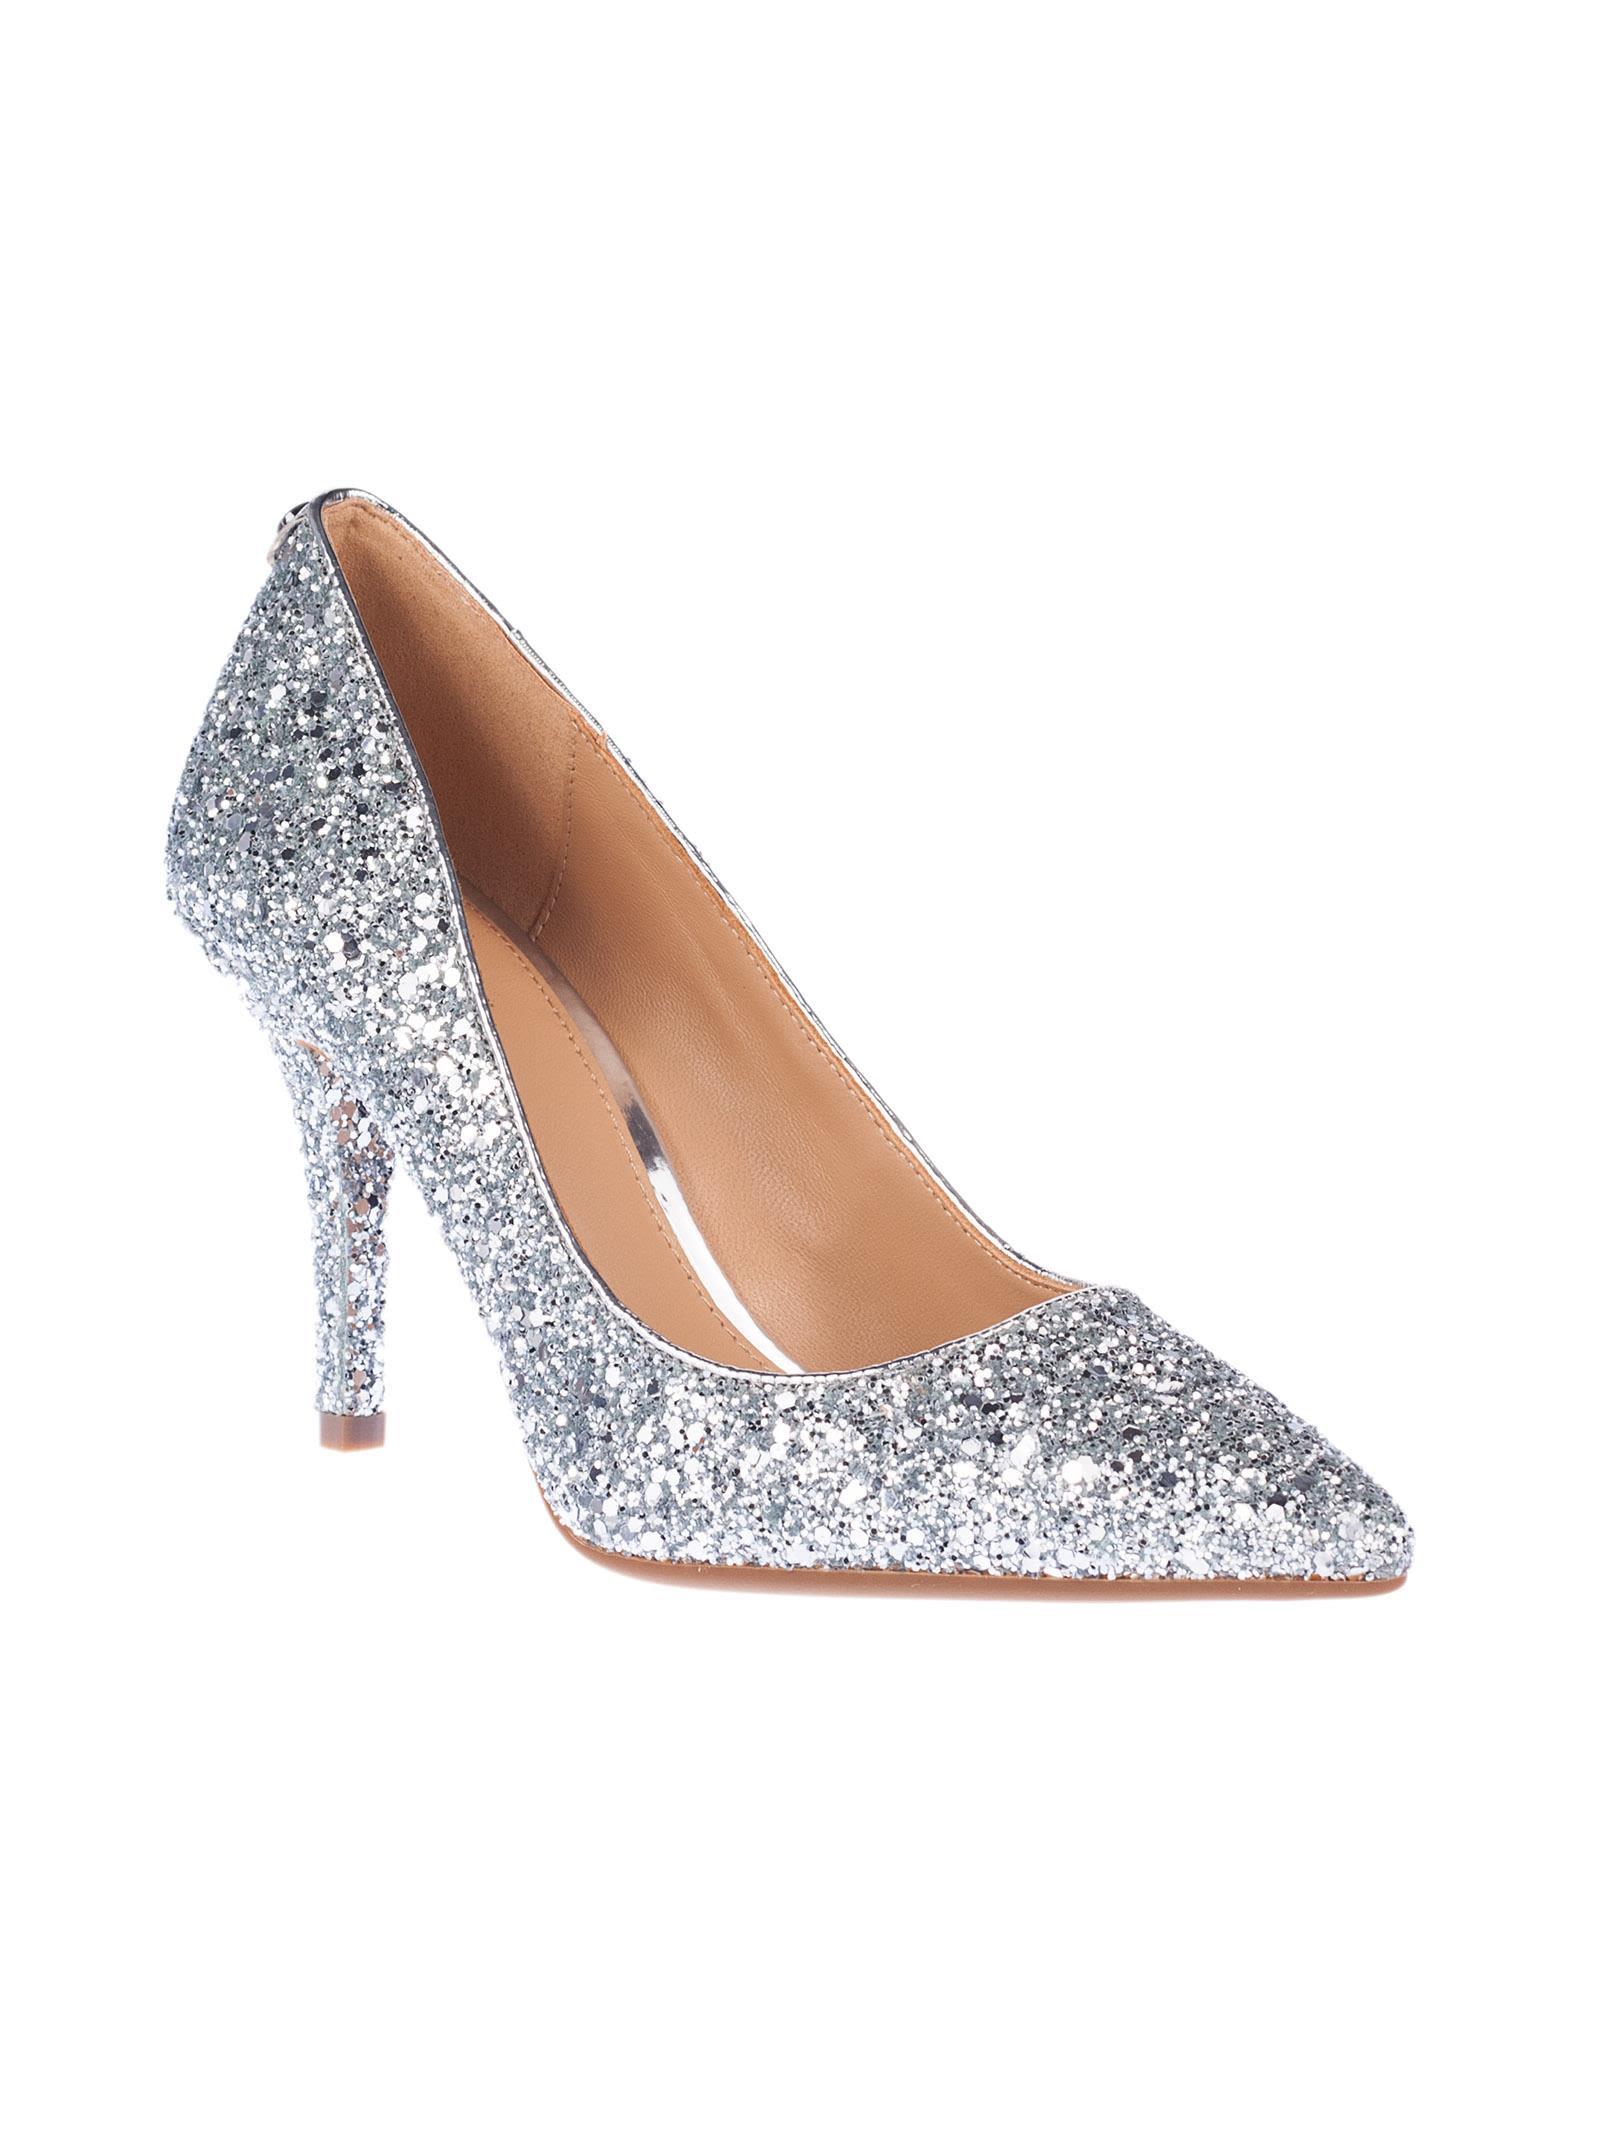 michael kors michael michael kors mk flex pumps silver women 39 s high heeled shoes italist. Black Bedroom Furniture Sets. Home Design Ideas